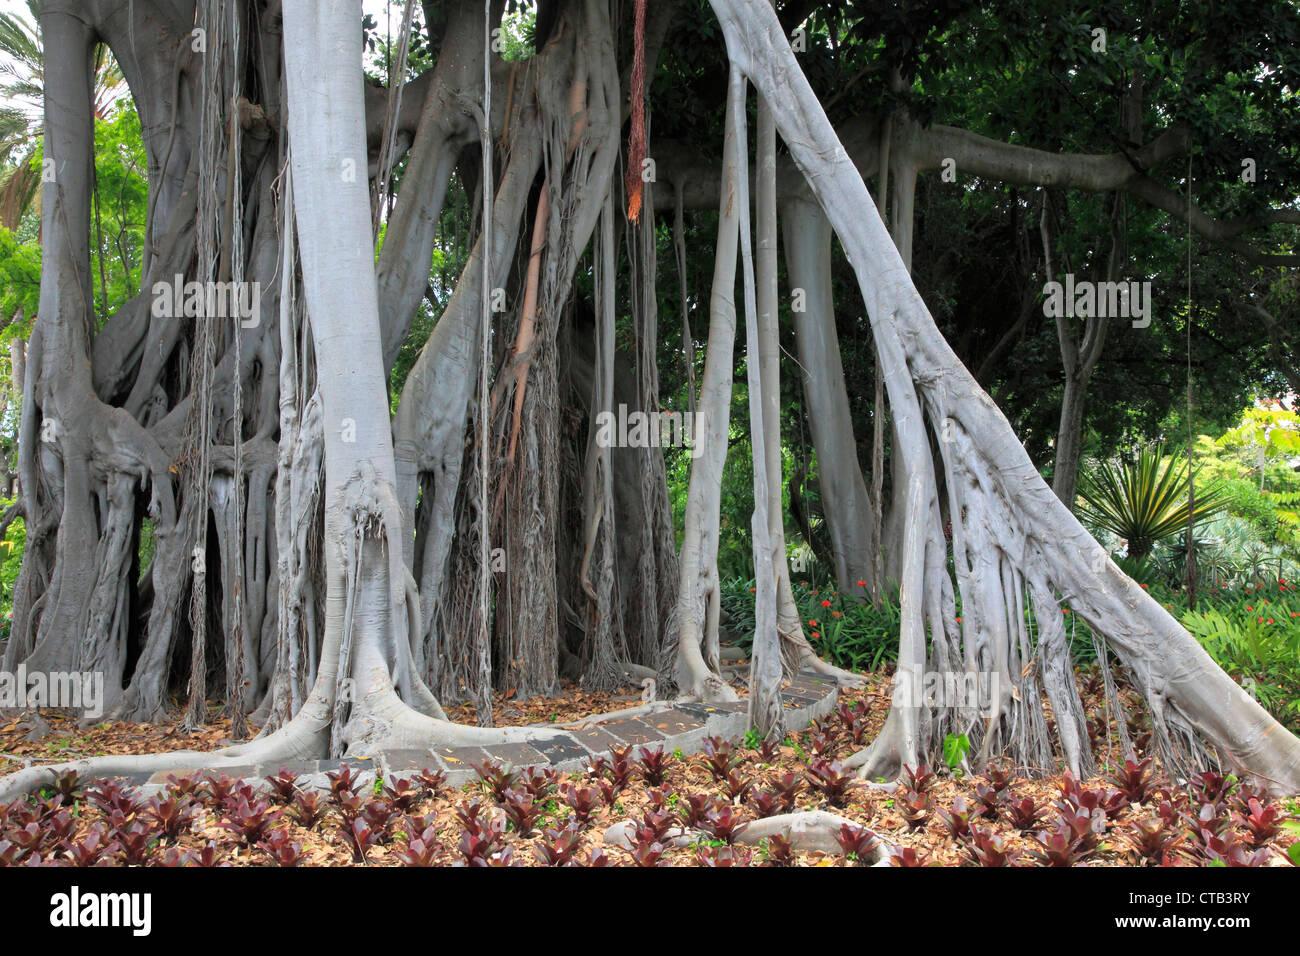 Spain, Canary Islands, Tenerife, Lord Howe's fig tree, ficus macrophylla columnaris, - Stock Image